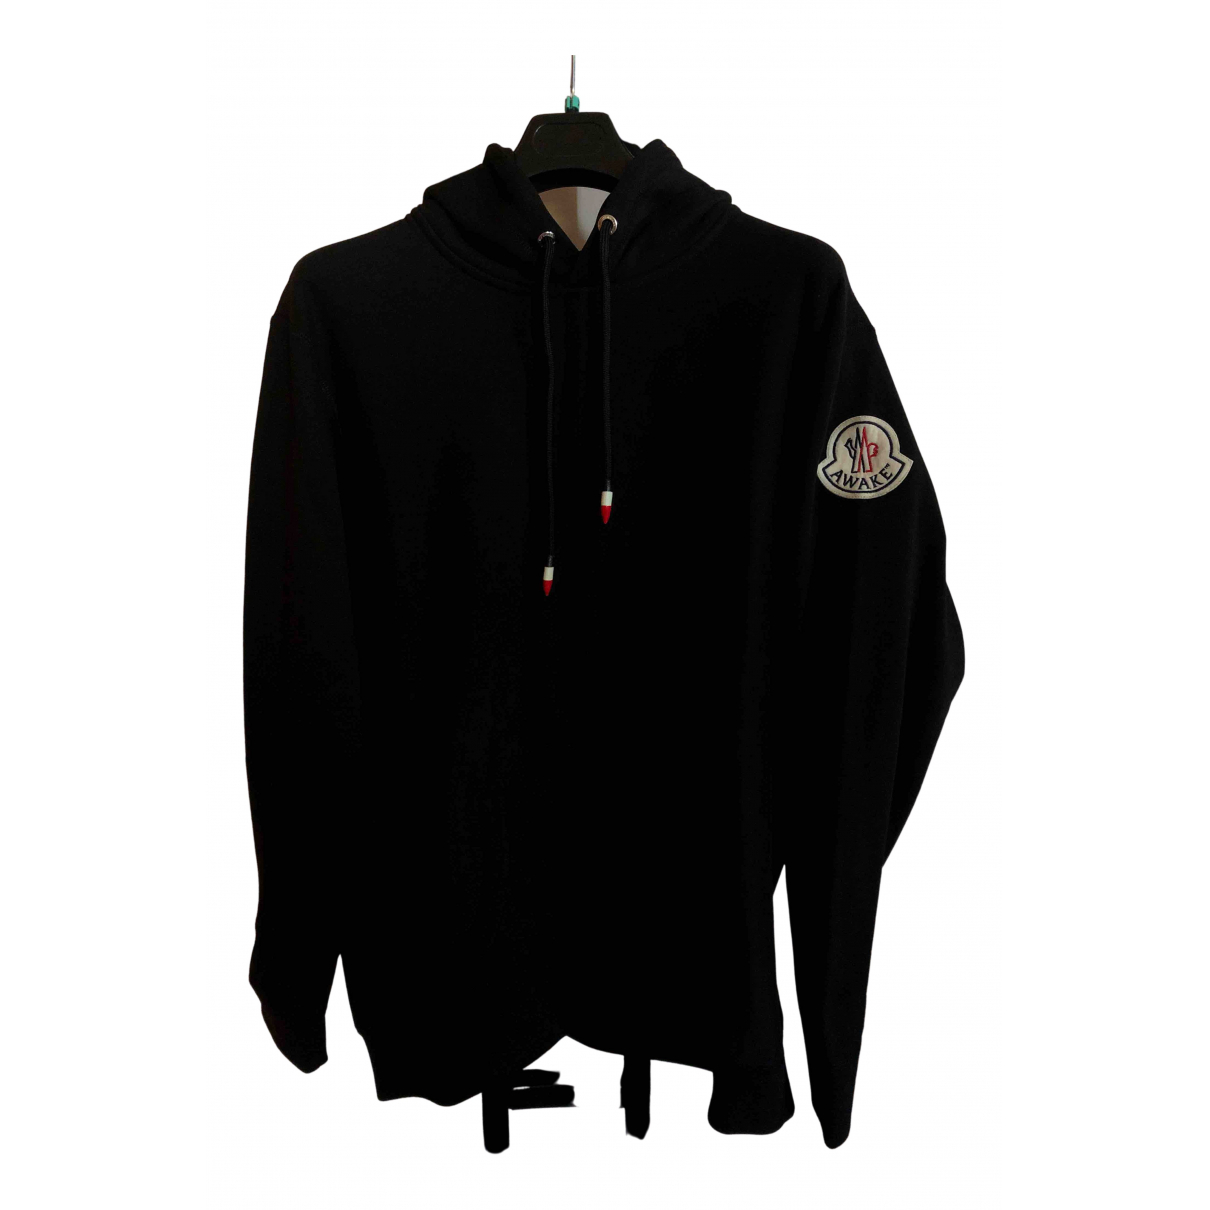 Moncler Genius Moncler n°2 1952 + Valextra Black Cotton Knitwear & Sweatshirts for Men L International